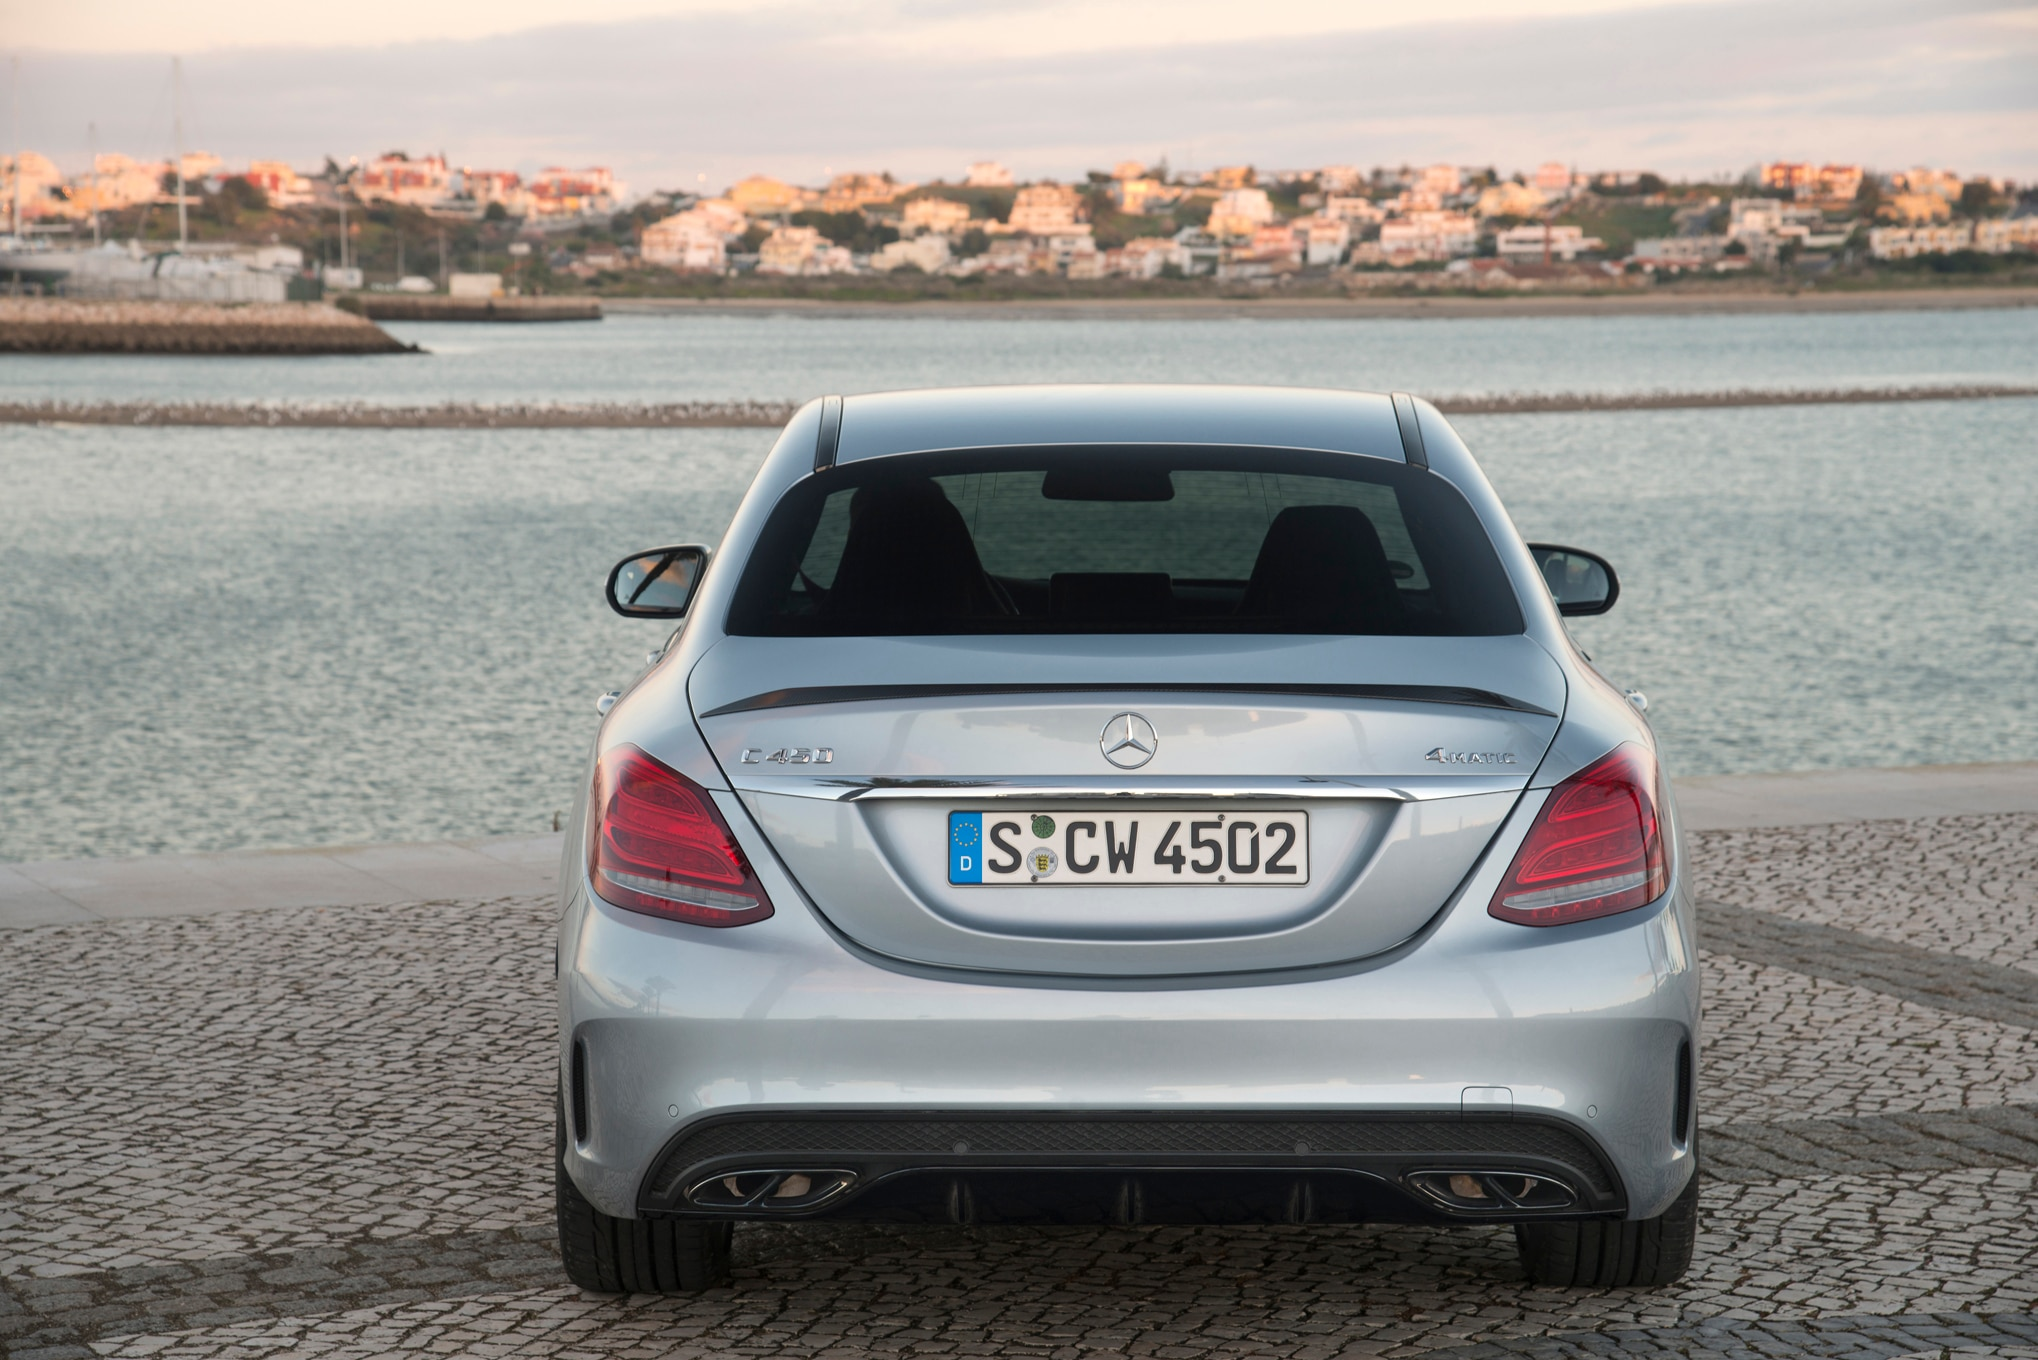 http://st.automobilemag.com/uploads/sites/11/2015/02/2016-Mercedes-Benz-C450-AMG-4Matic-rear-end.jpg